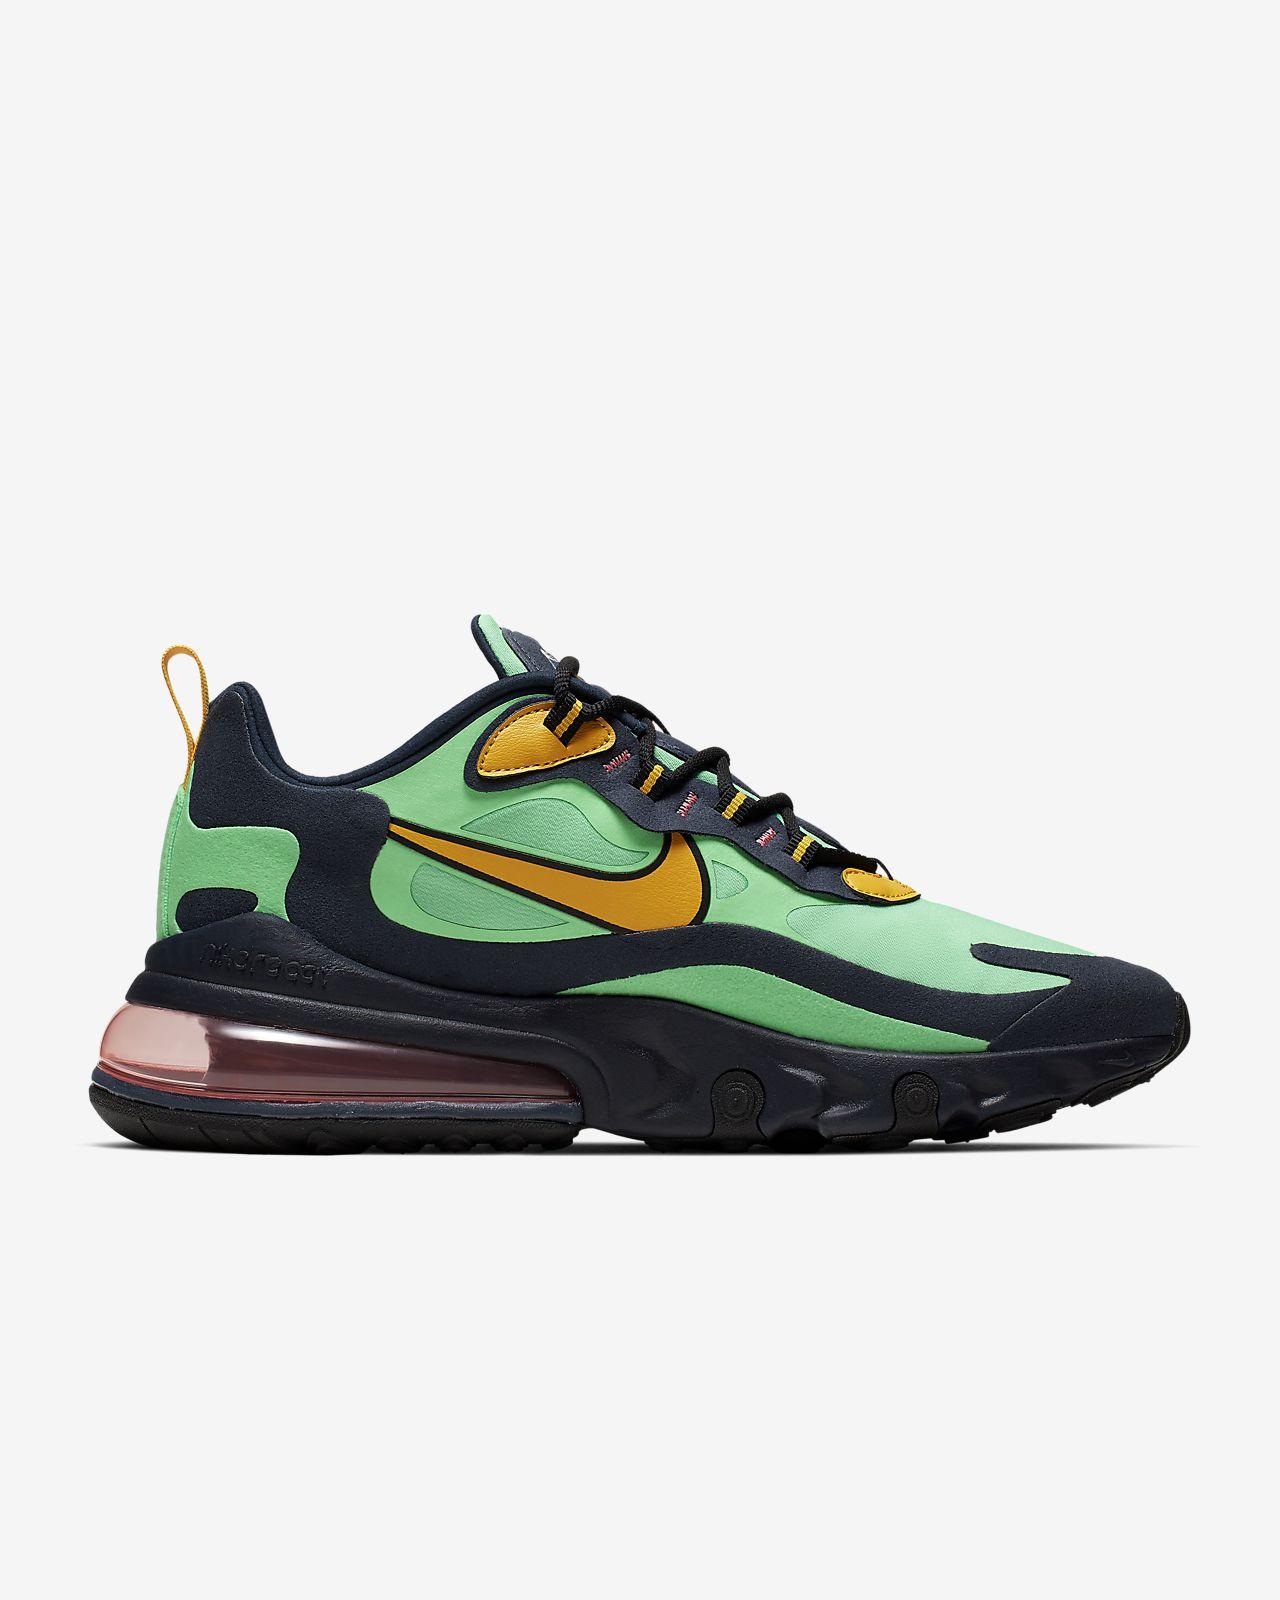 Nike Air Max 270 React (Pop Art) Men's Shoes